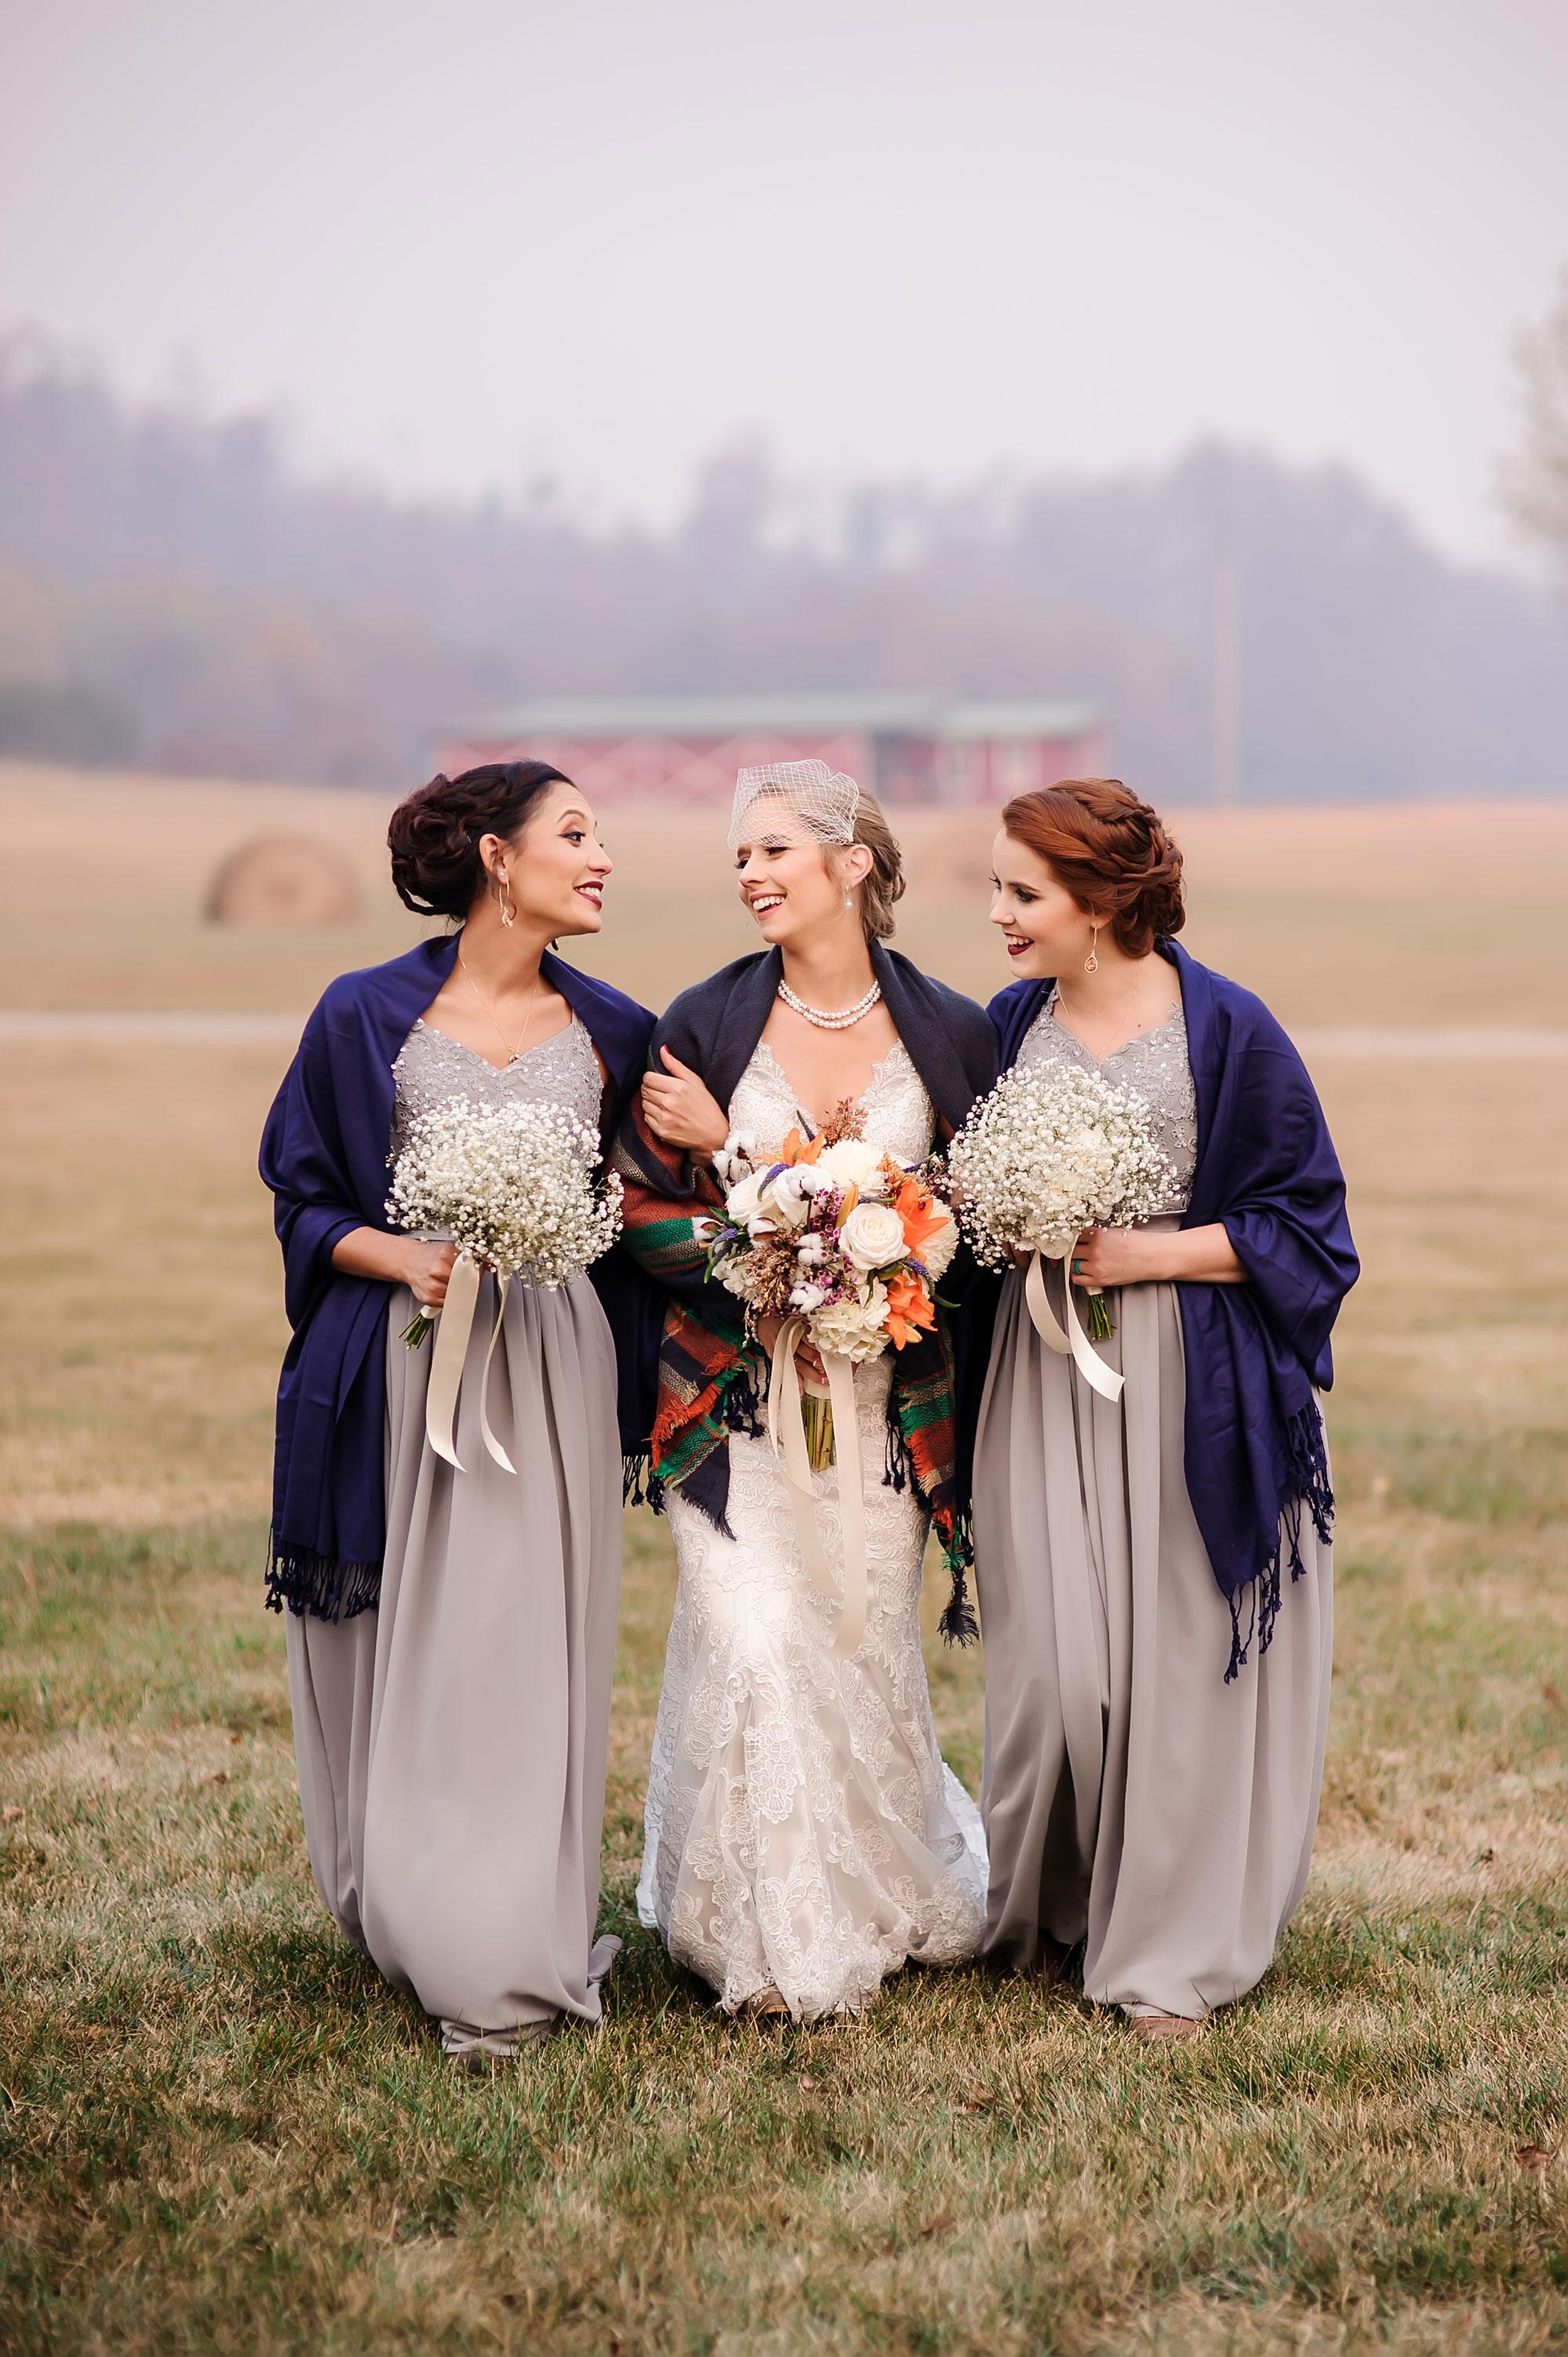 A Rustic Military Wedding in North Carolina